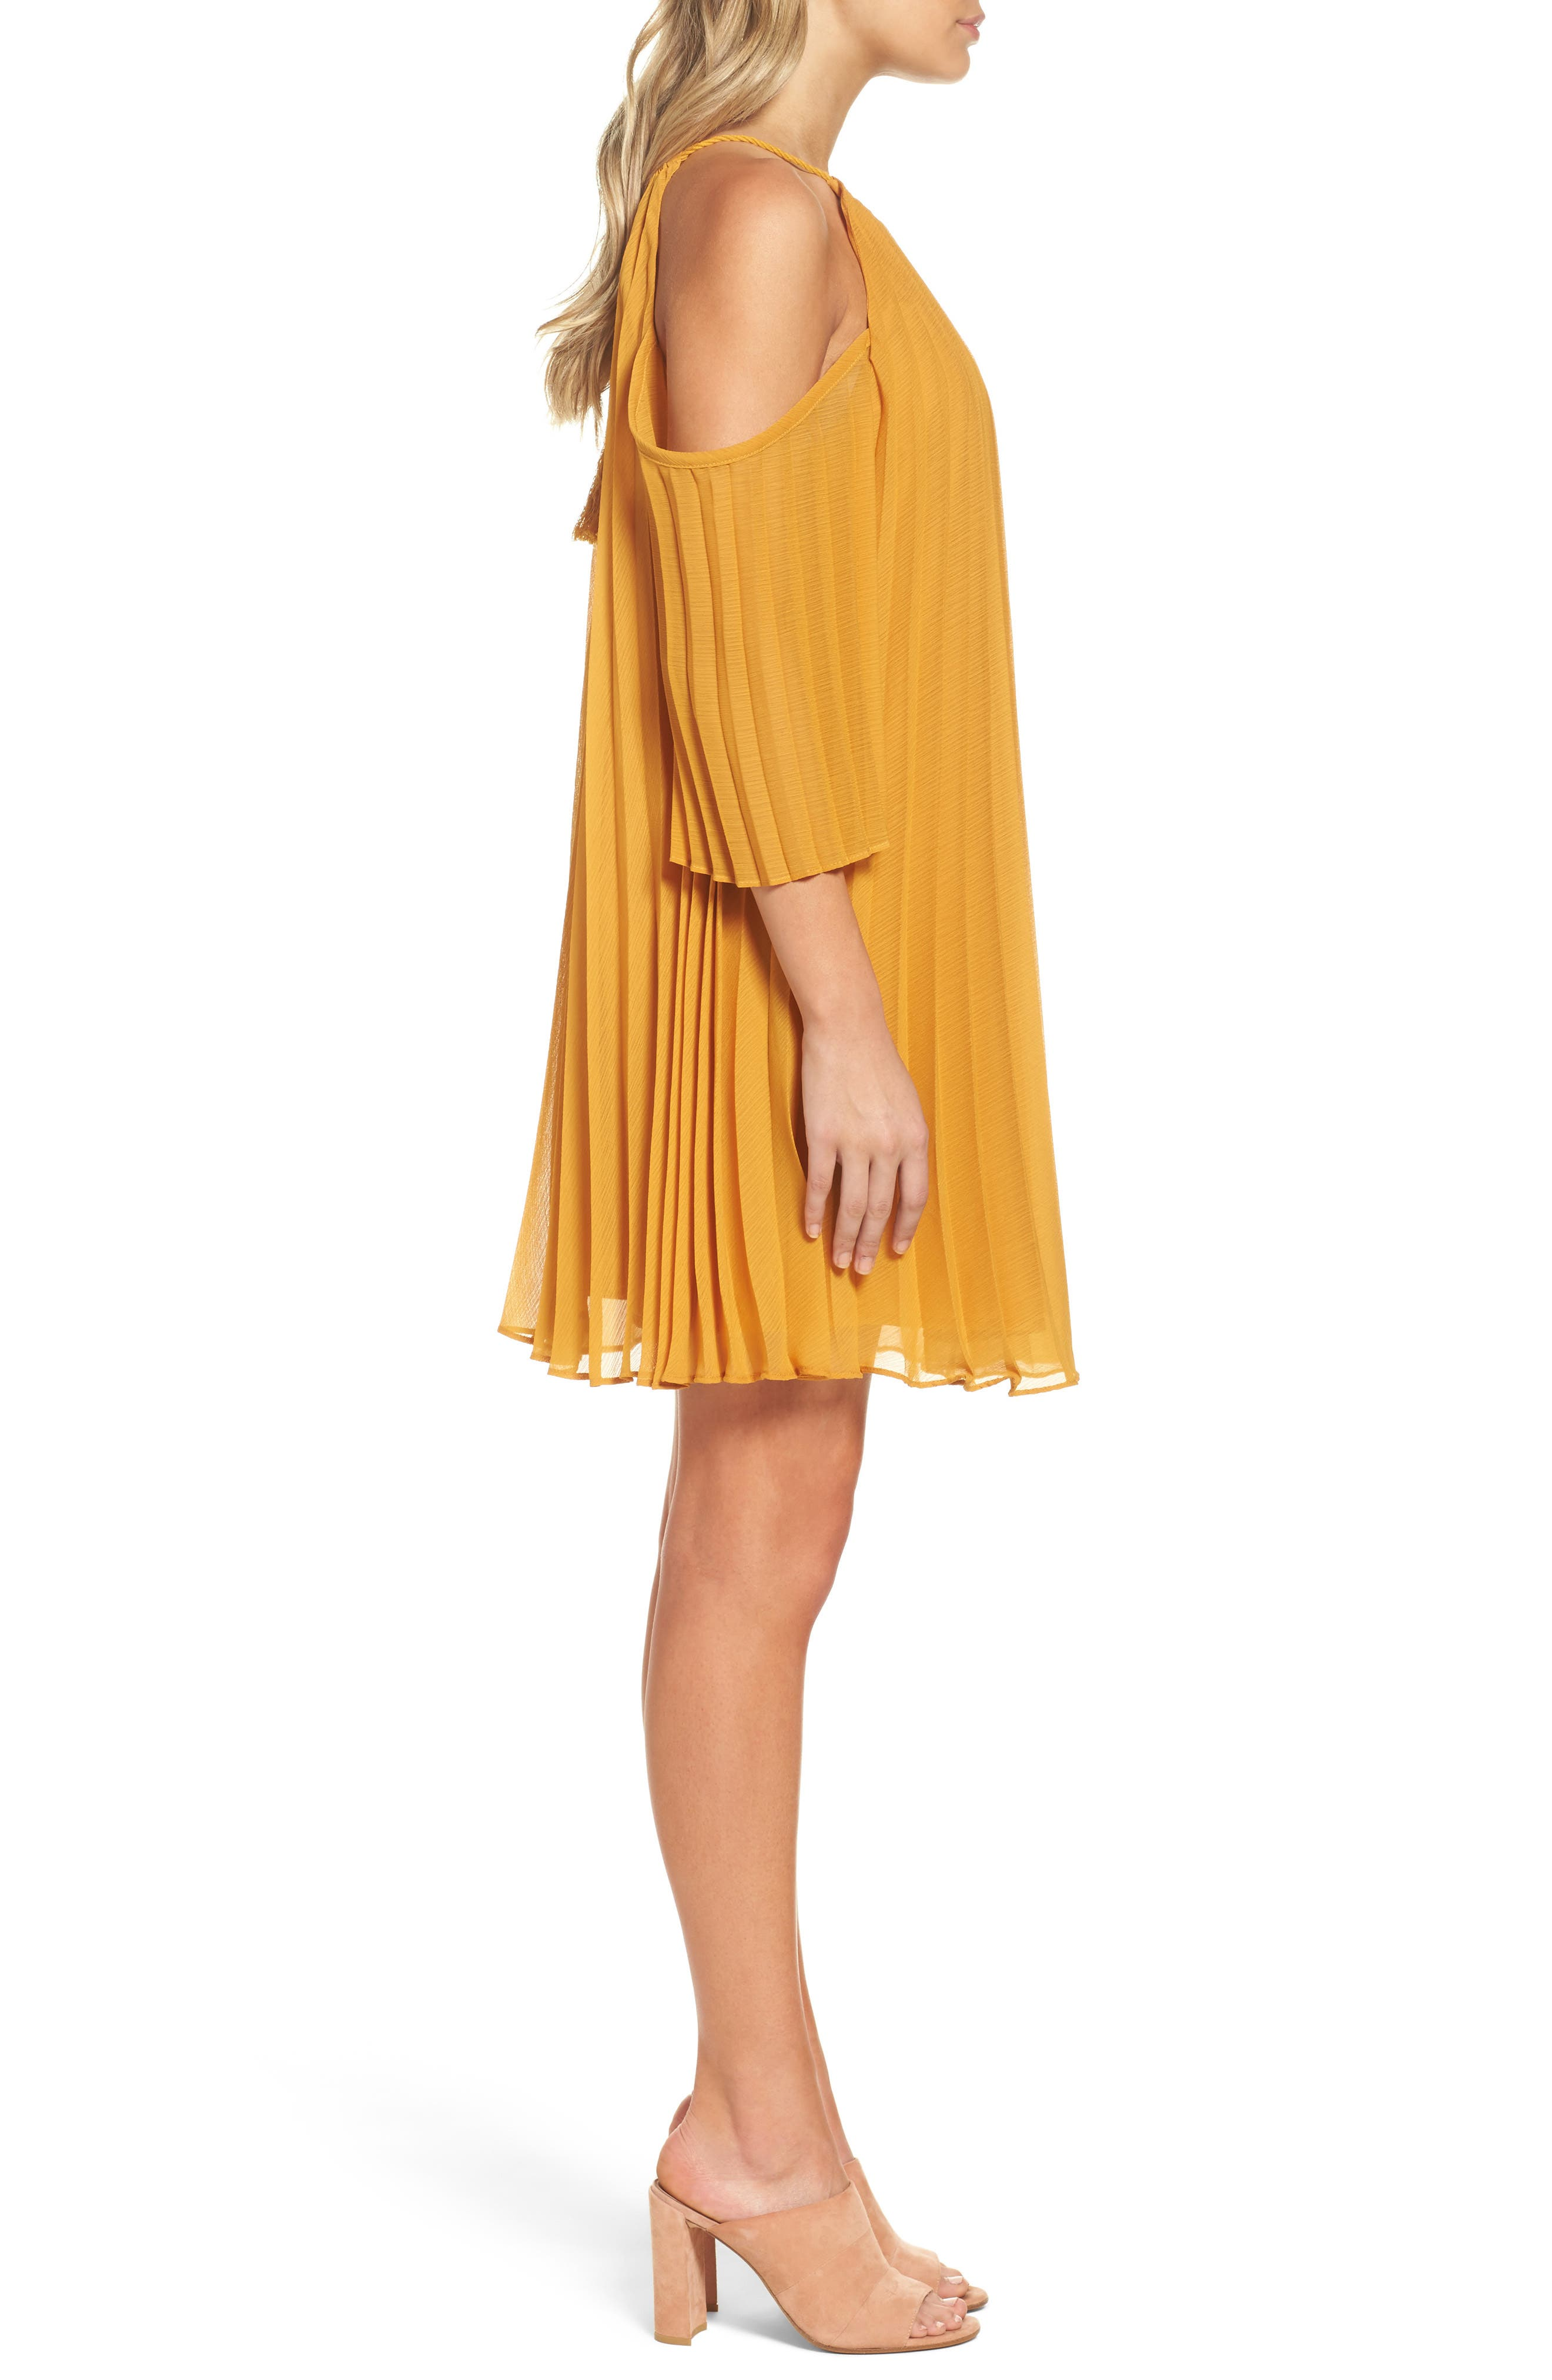 BB DAKOTA Gretal Cold Shoulder Pleated Dress in Royalty Yellow